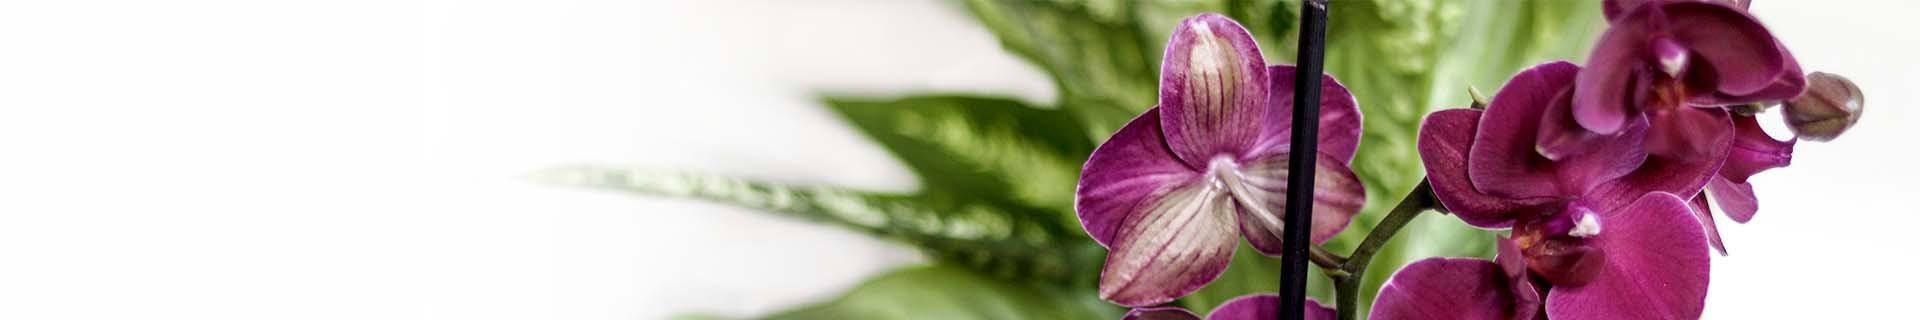 Plantas de interior Citysens